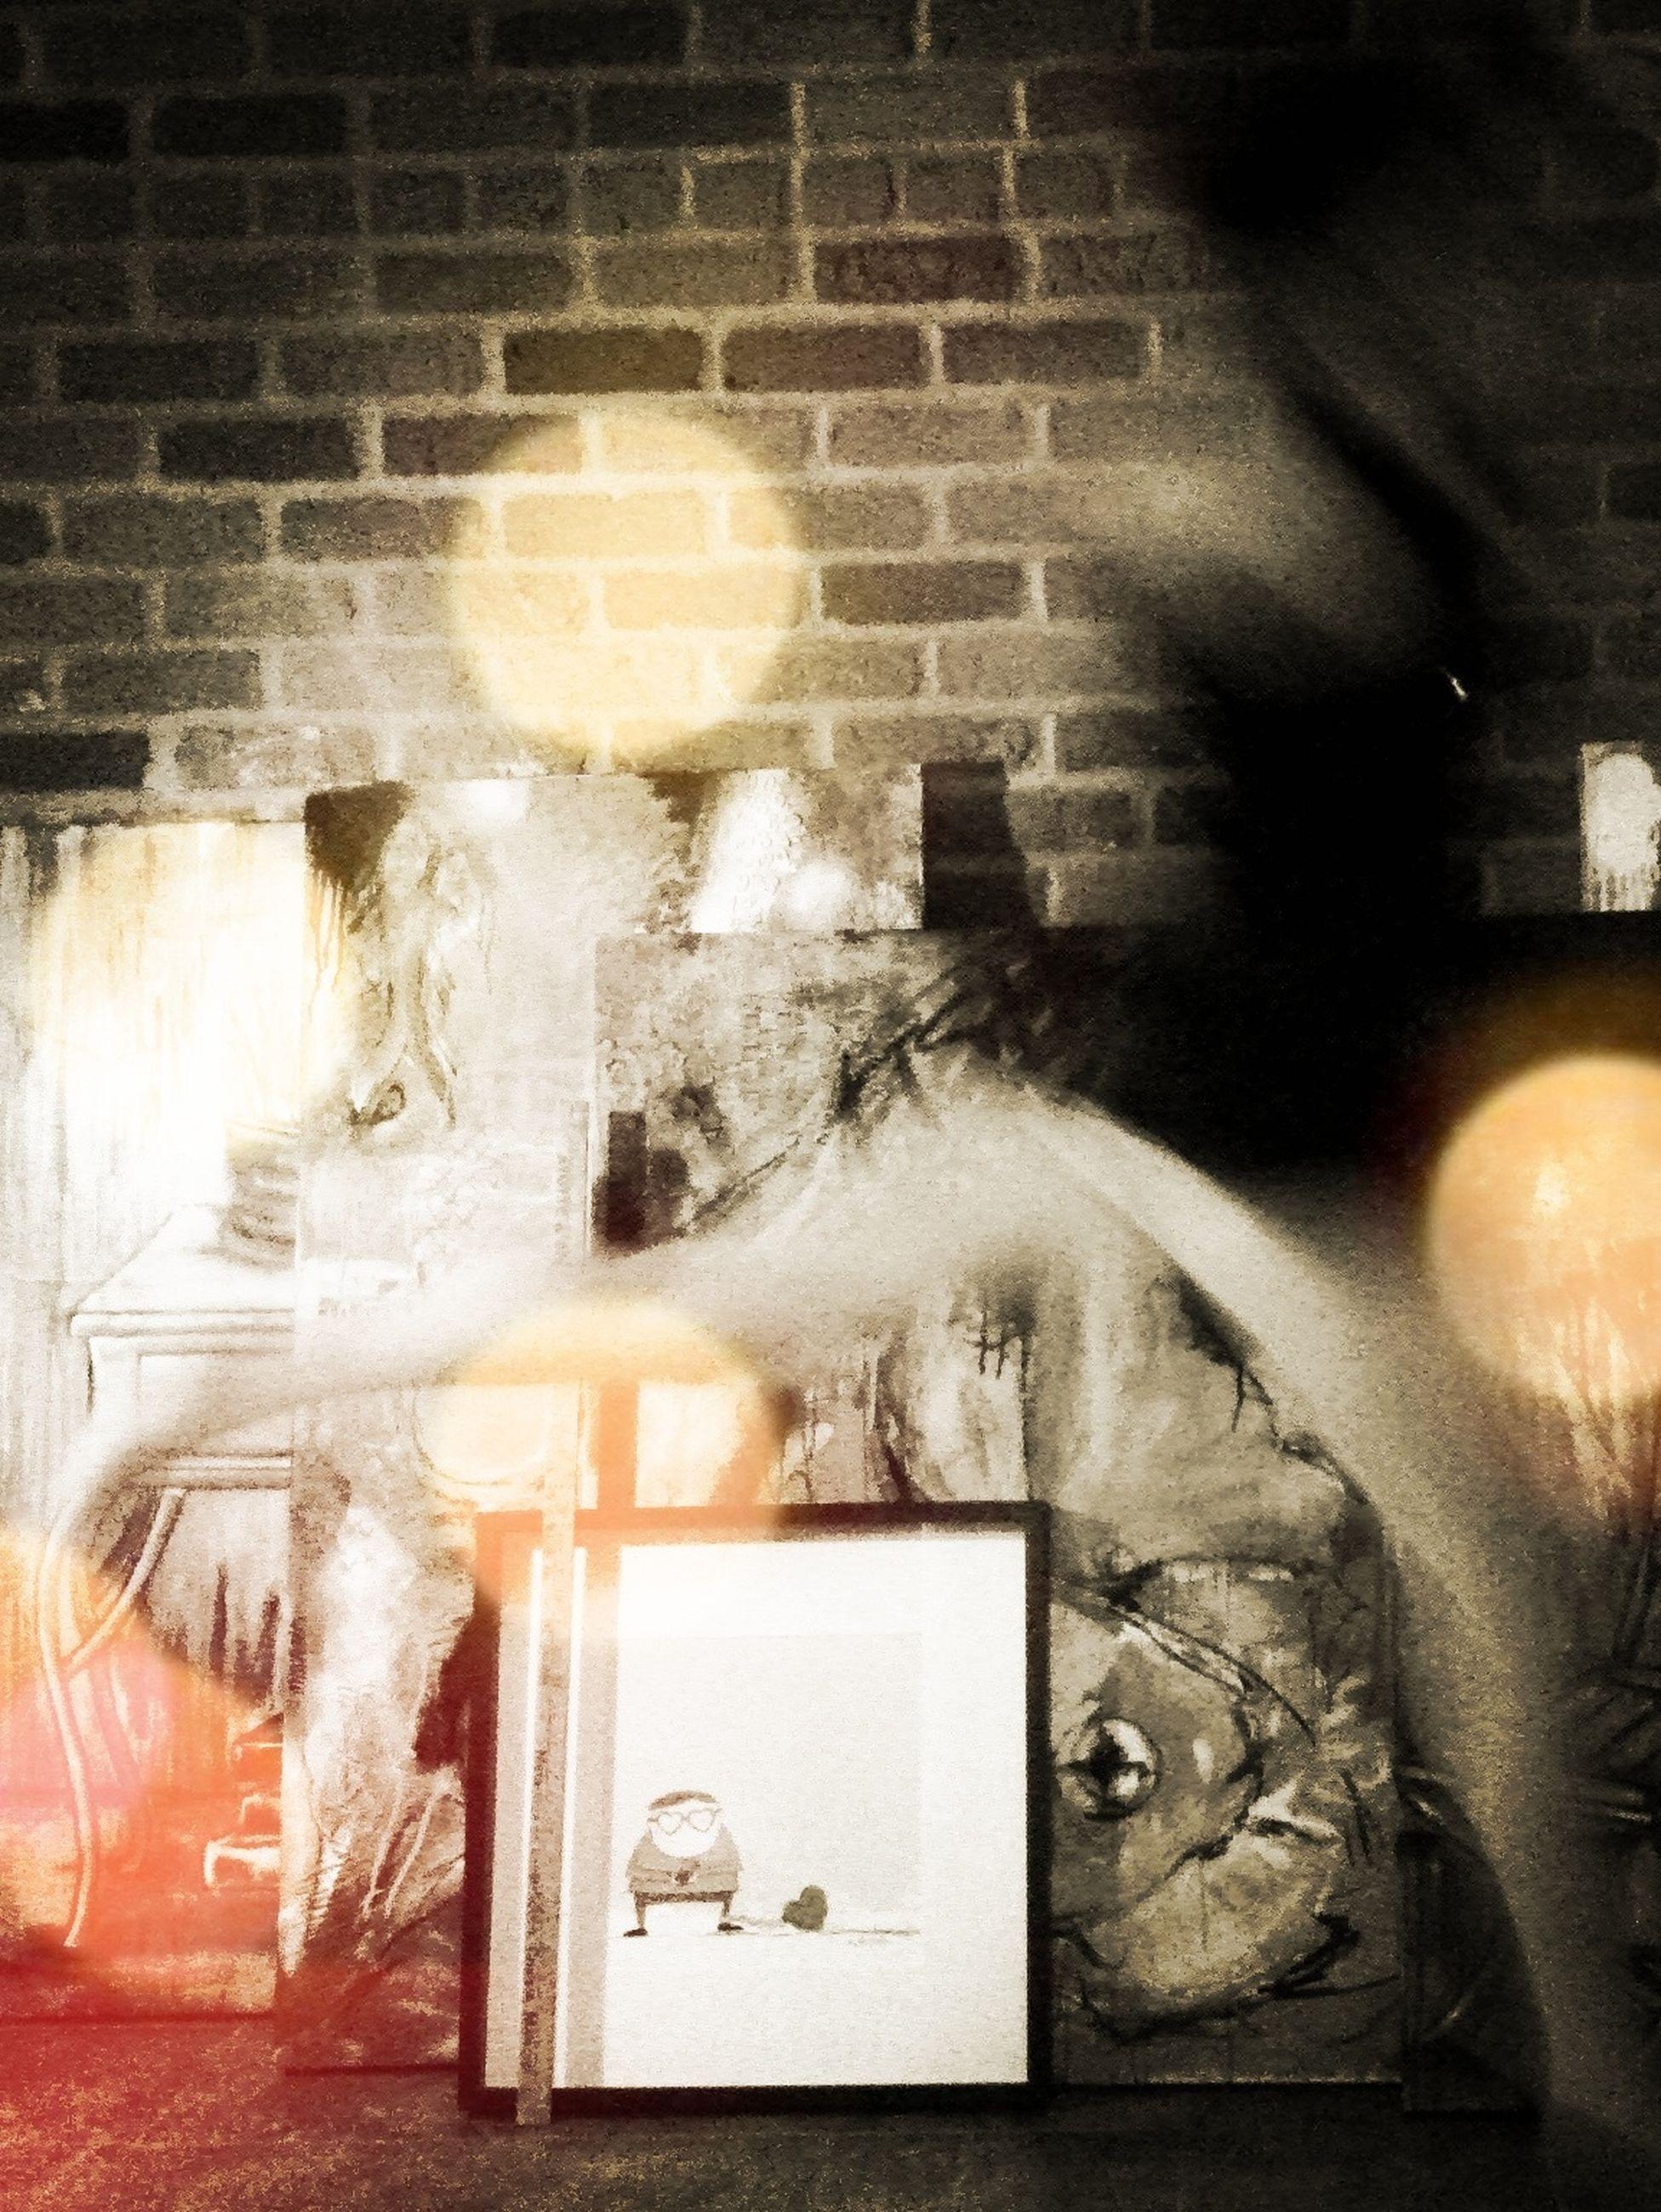 indoors, wall - building feature, art and craft, art, creativity, domestic animals, domestic cat, cat, human representation, animal representation, no people, animal themes, pets, reflection, close-up, mammal, wall, built structure, illuminated, graffiti